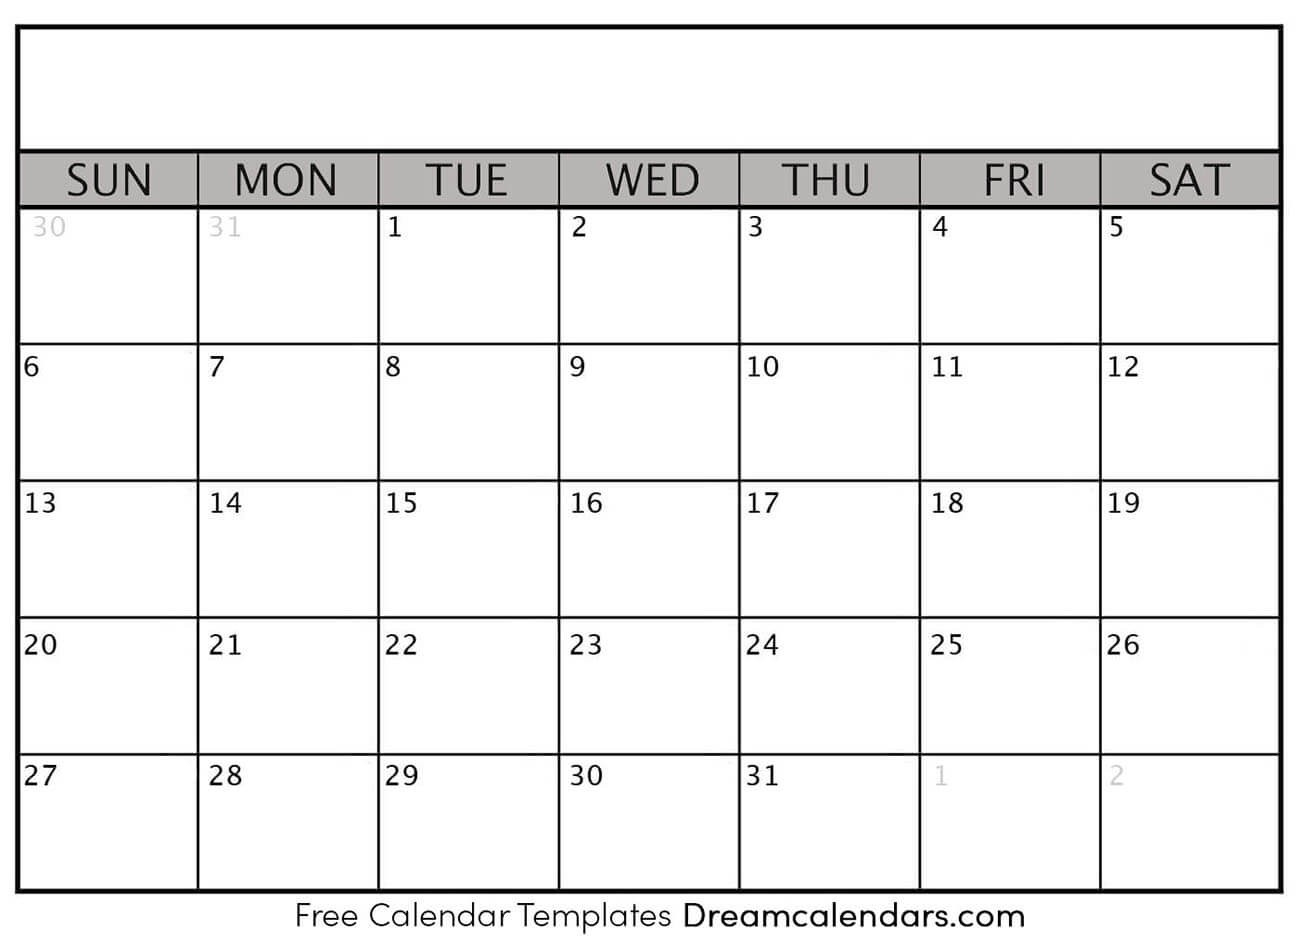 Printable Blank Calendar 2021 | Dream Calendars  Printable Full Page Blank Calendar Template